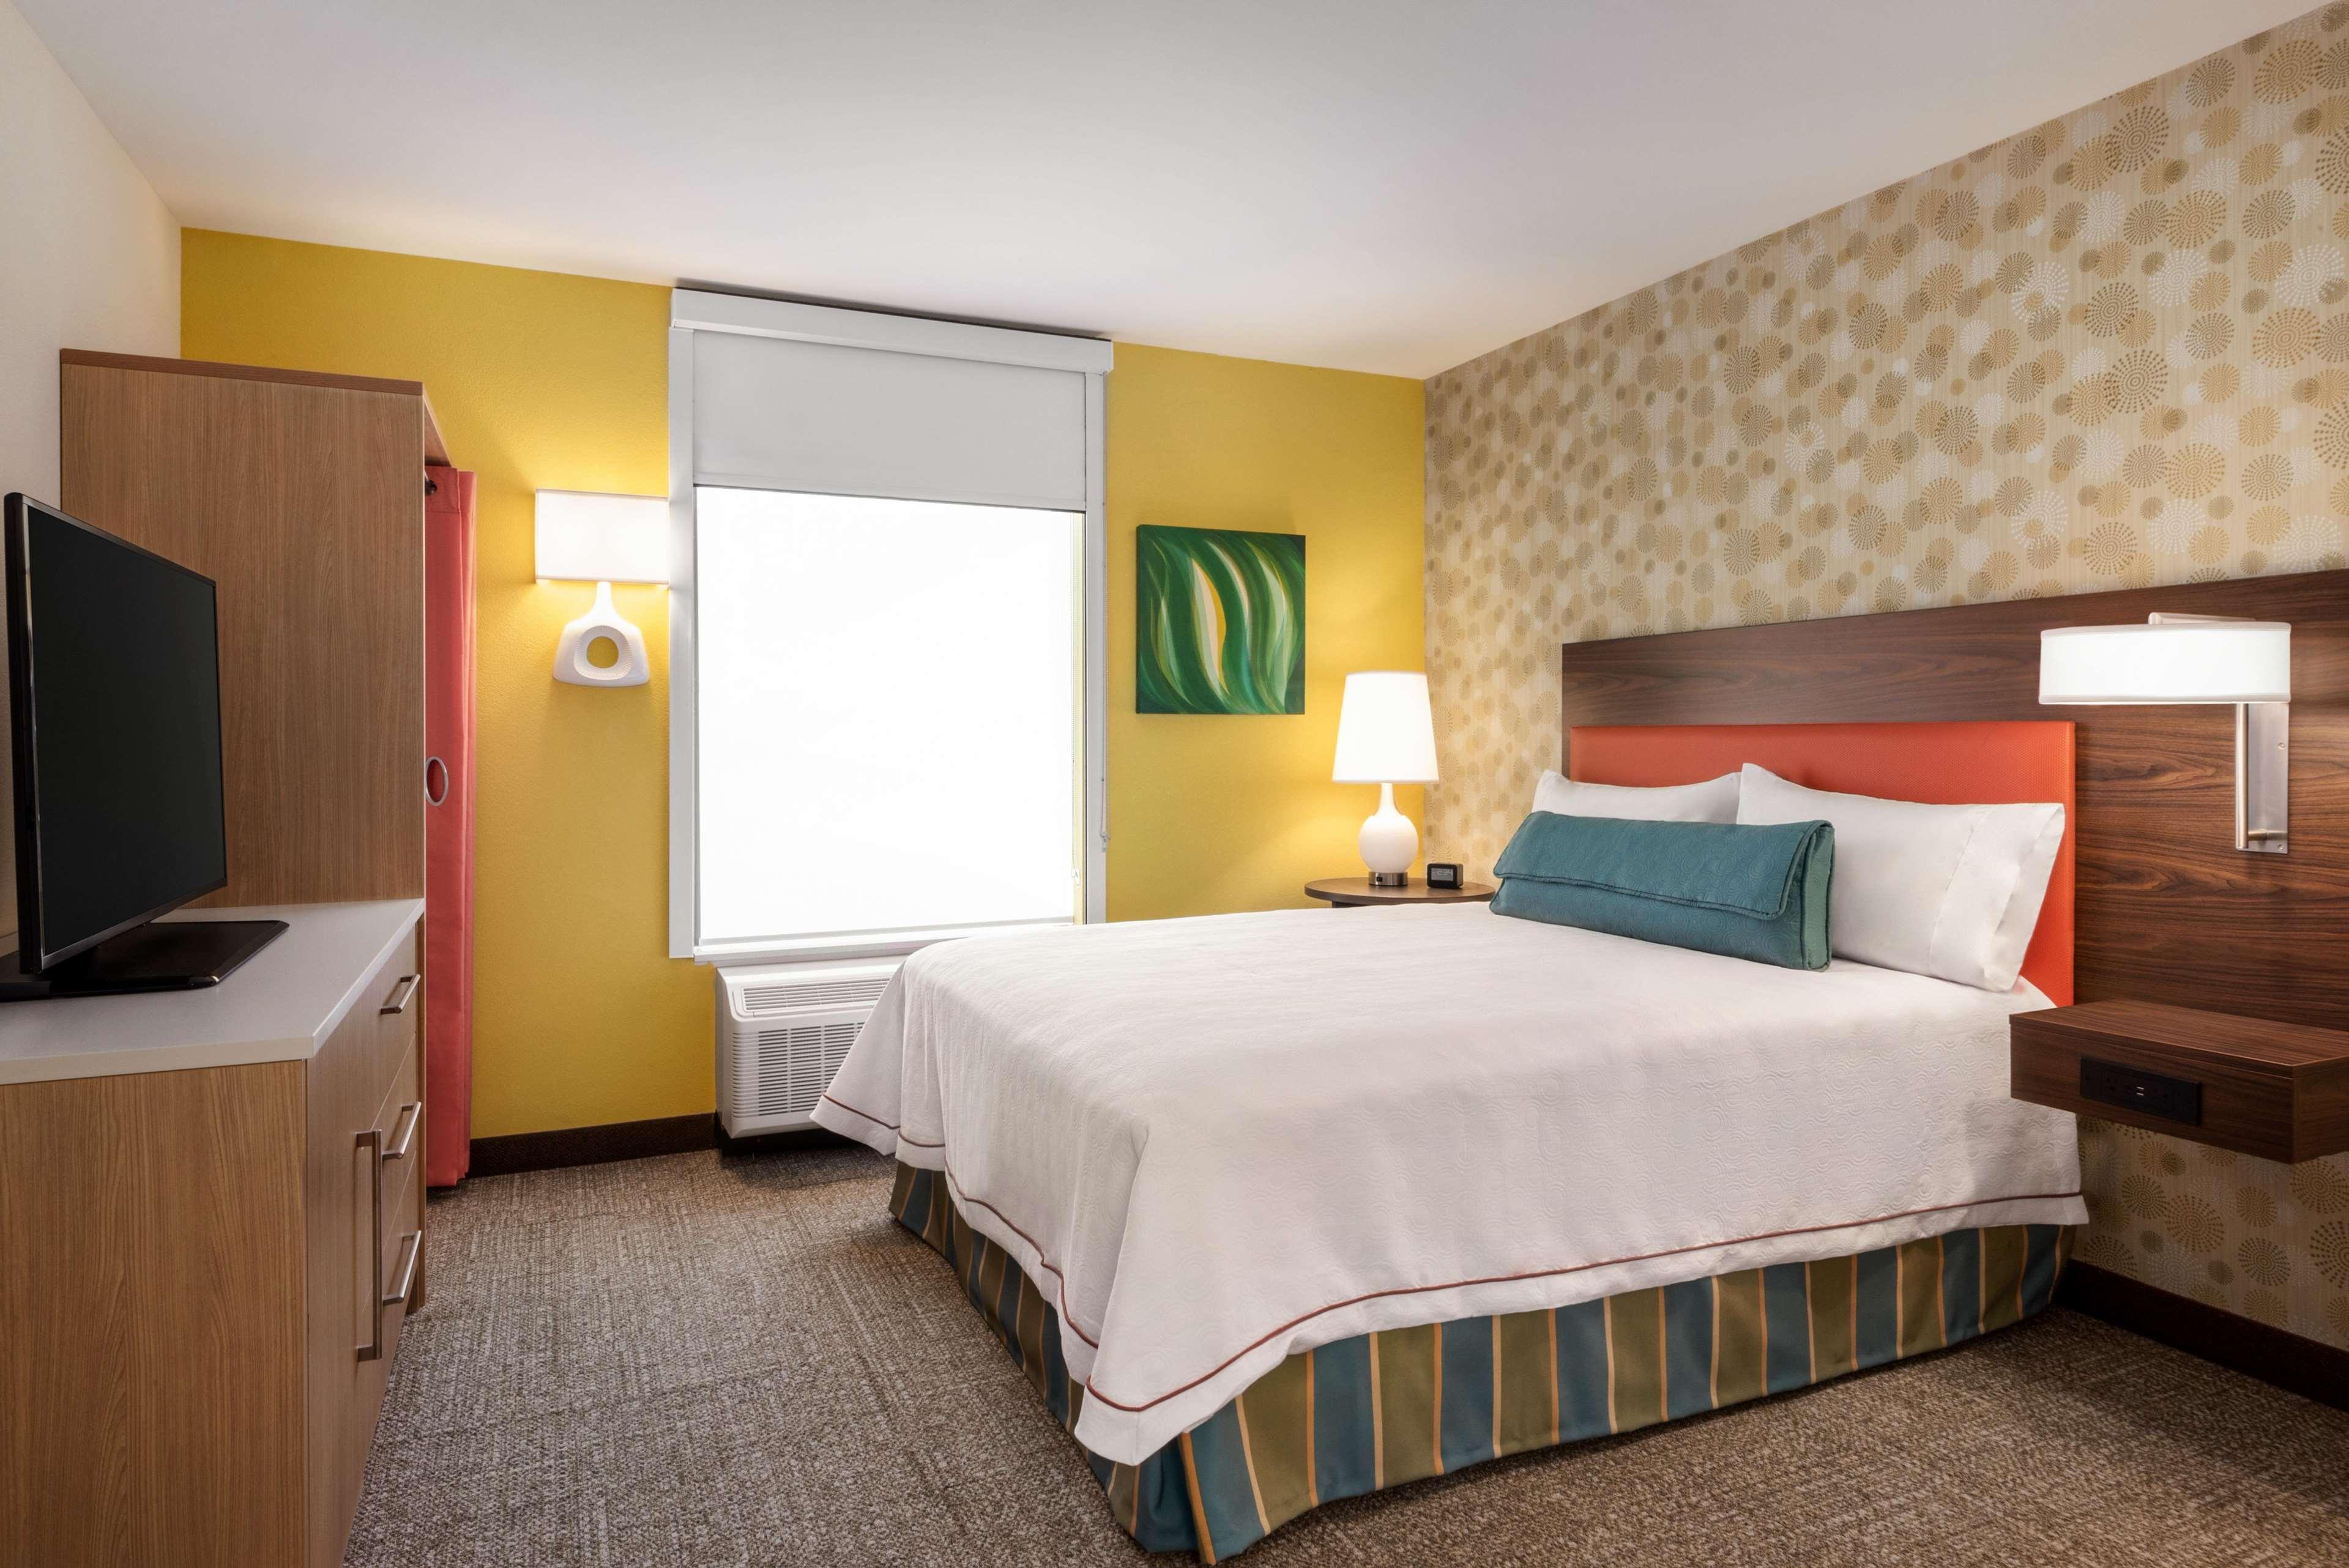 Home2 Suites by Hilton Waco image 8